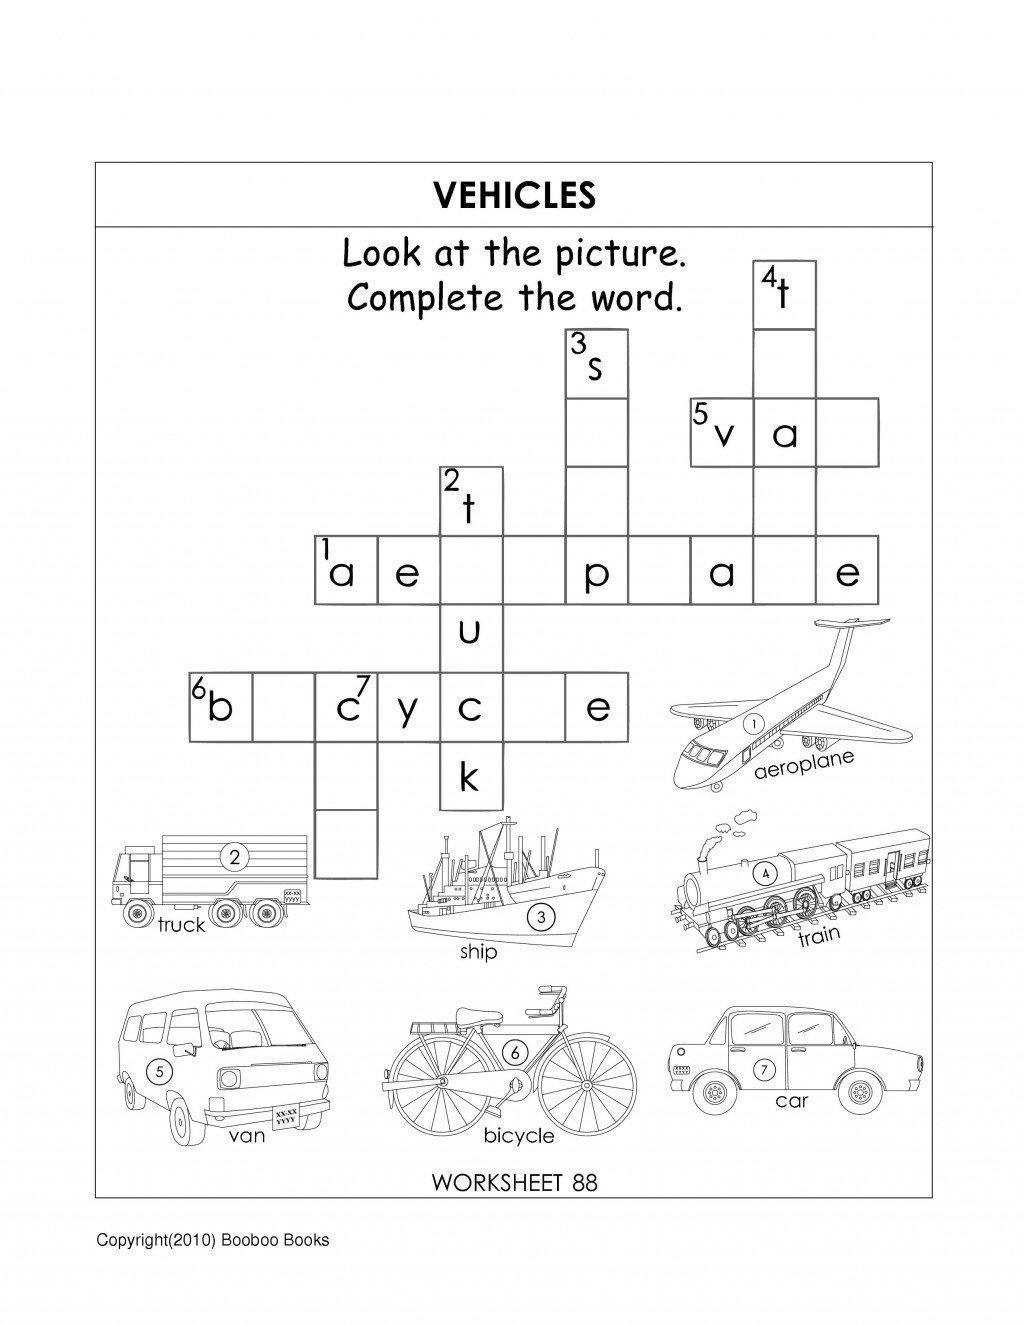 Drawing Worksheet For Kindergarten at GetDrawings.com | Free for ...